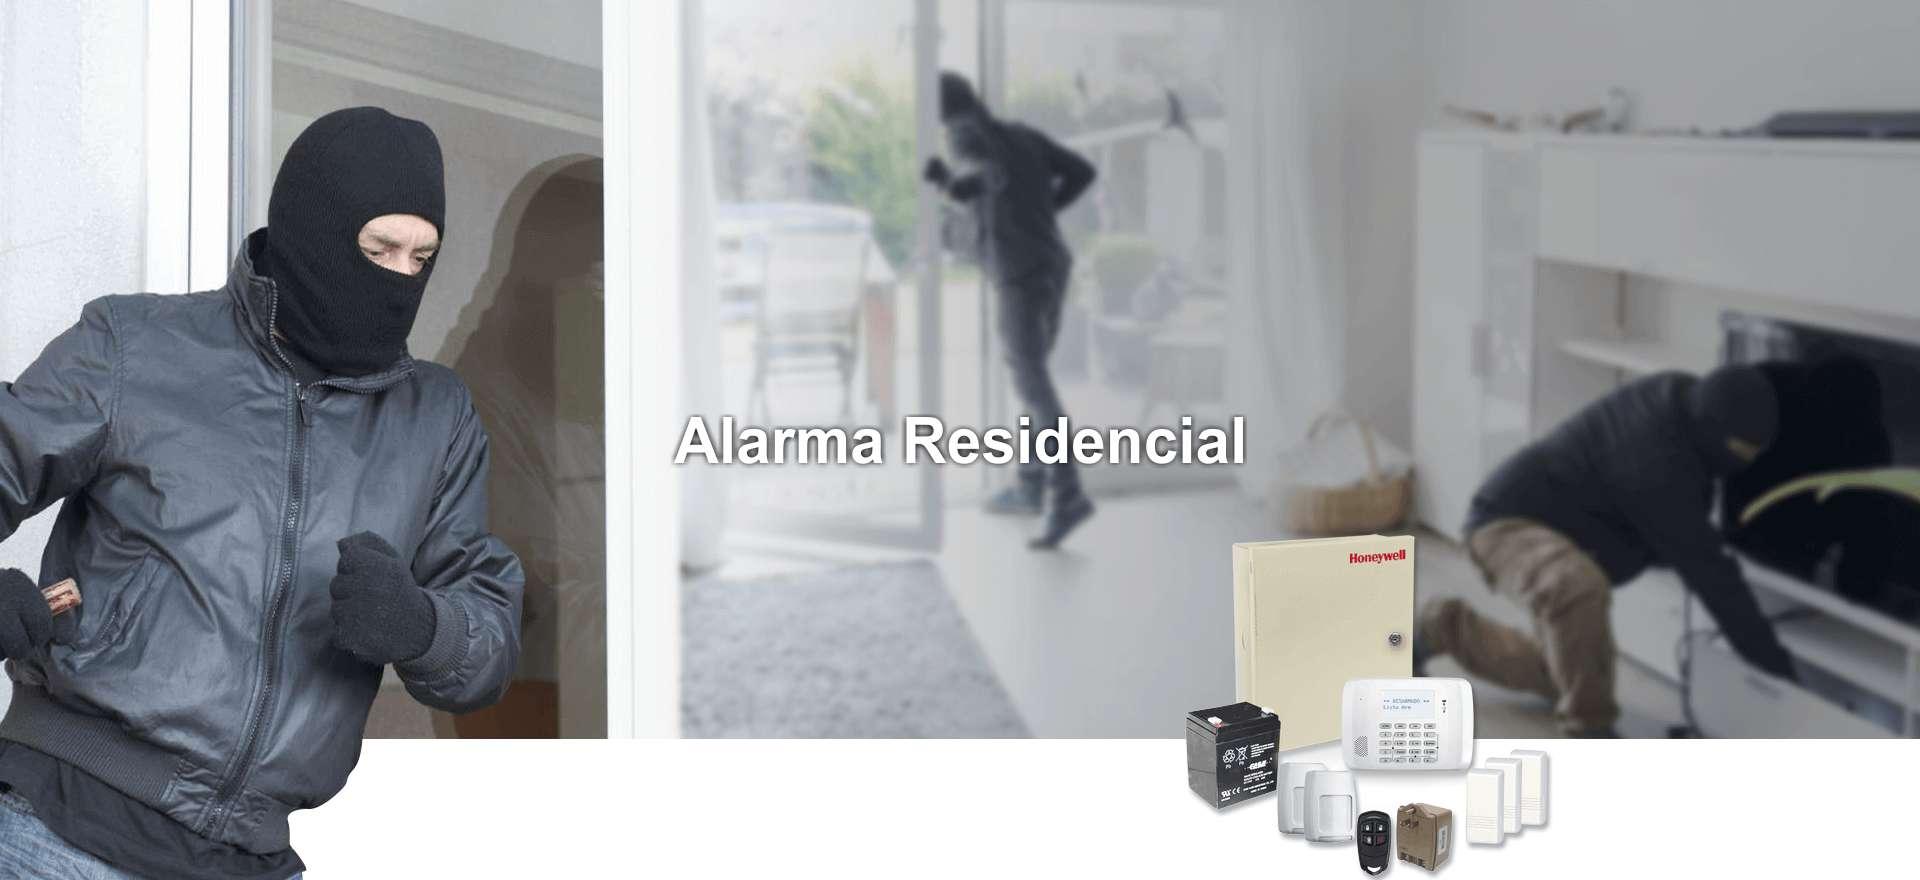 Sistema de Alarma Residencial. Alarmas para Casa Habitación en Lázaro Cárdenas, Michoacán e Ixtapa Zihuatanejo, Guerrero